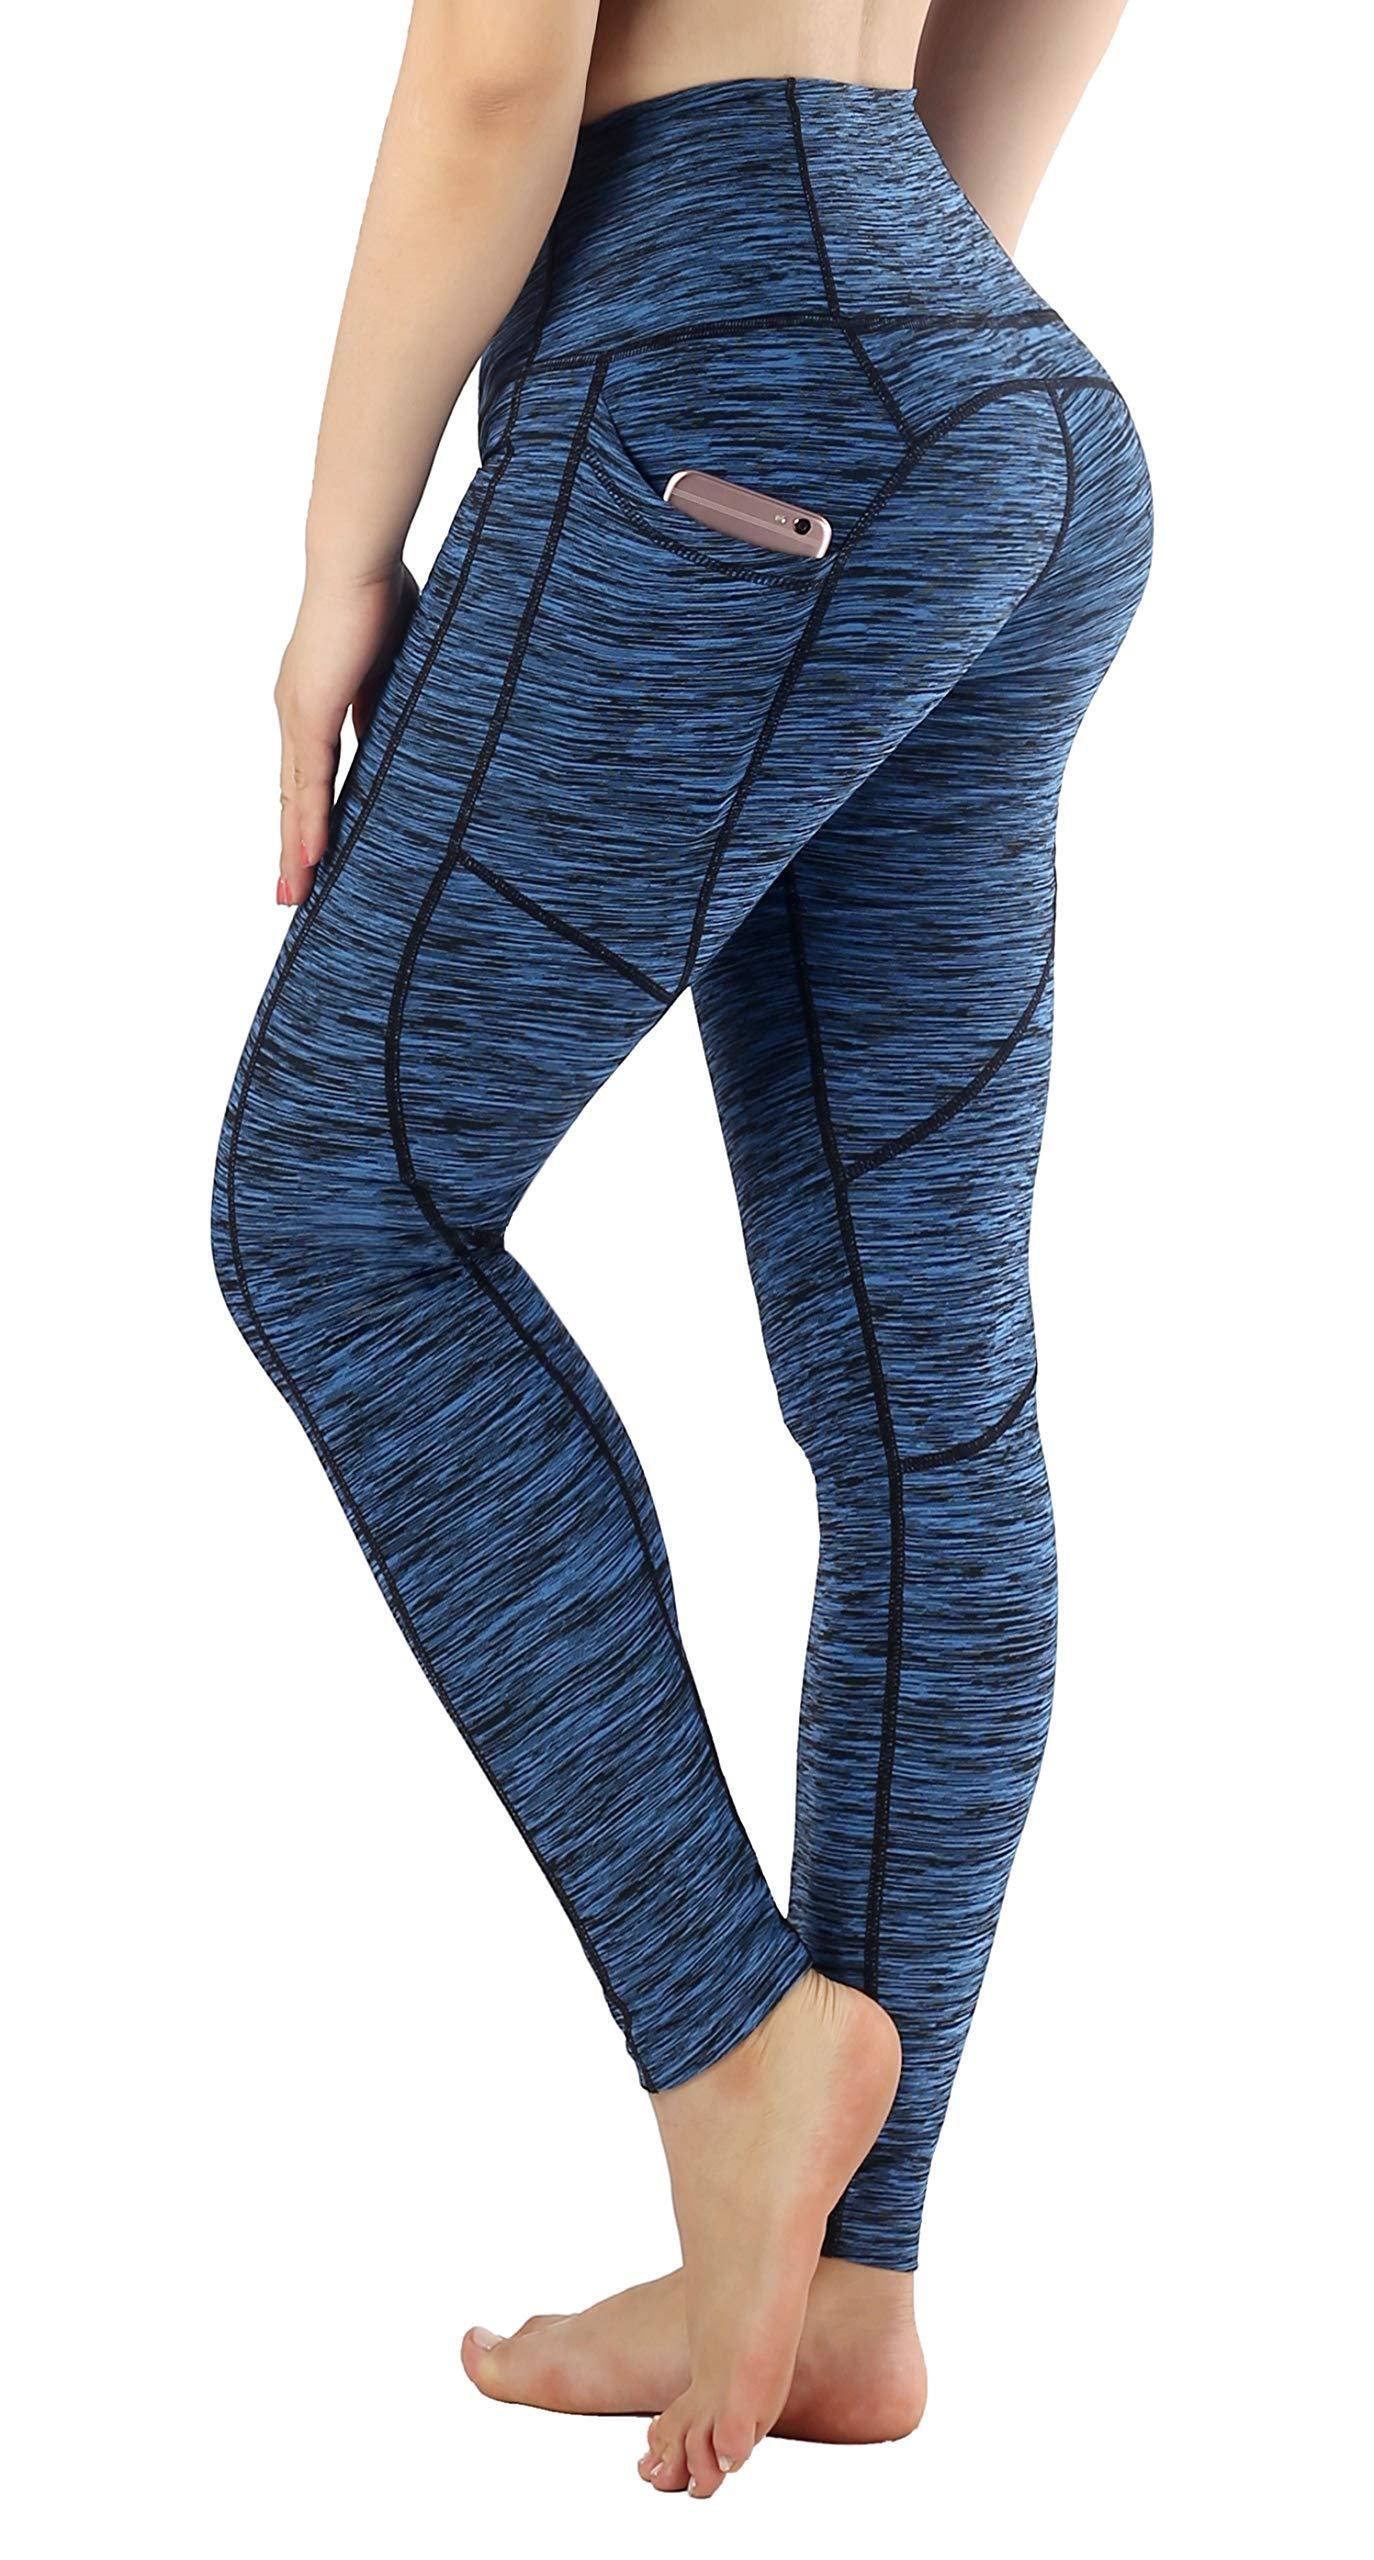 Sugar Pocket Women's Ankle Running Leggings Yoga Pants with Side Pocket L(Blue)